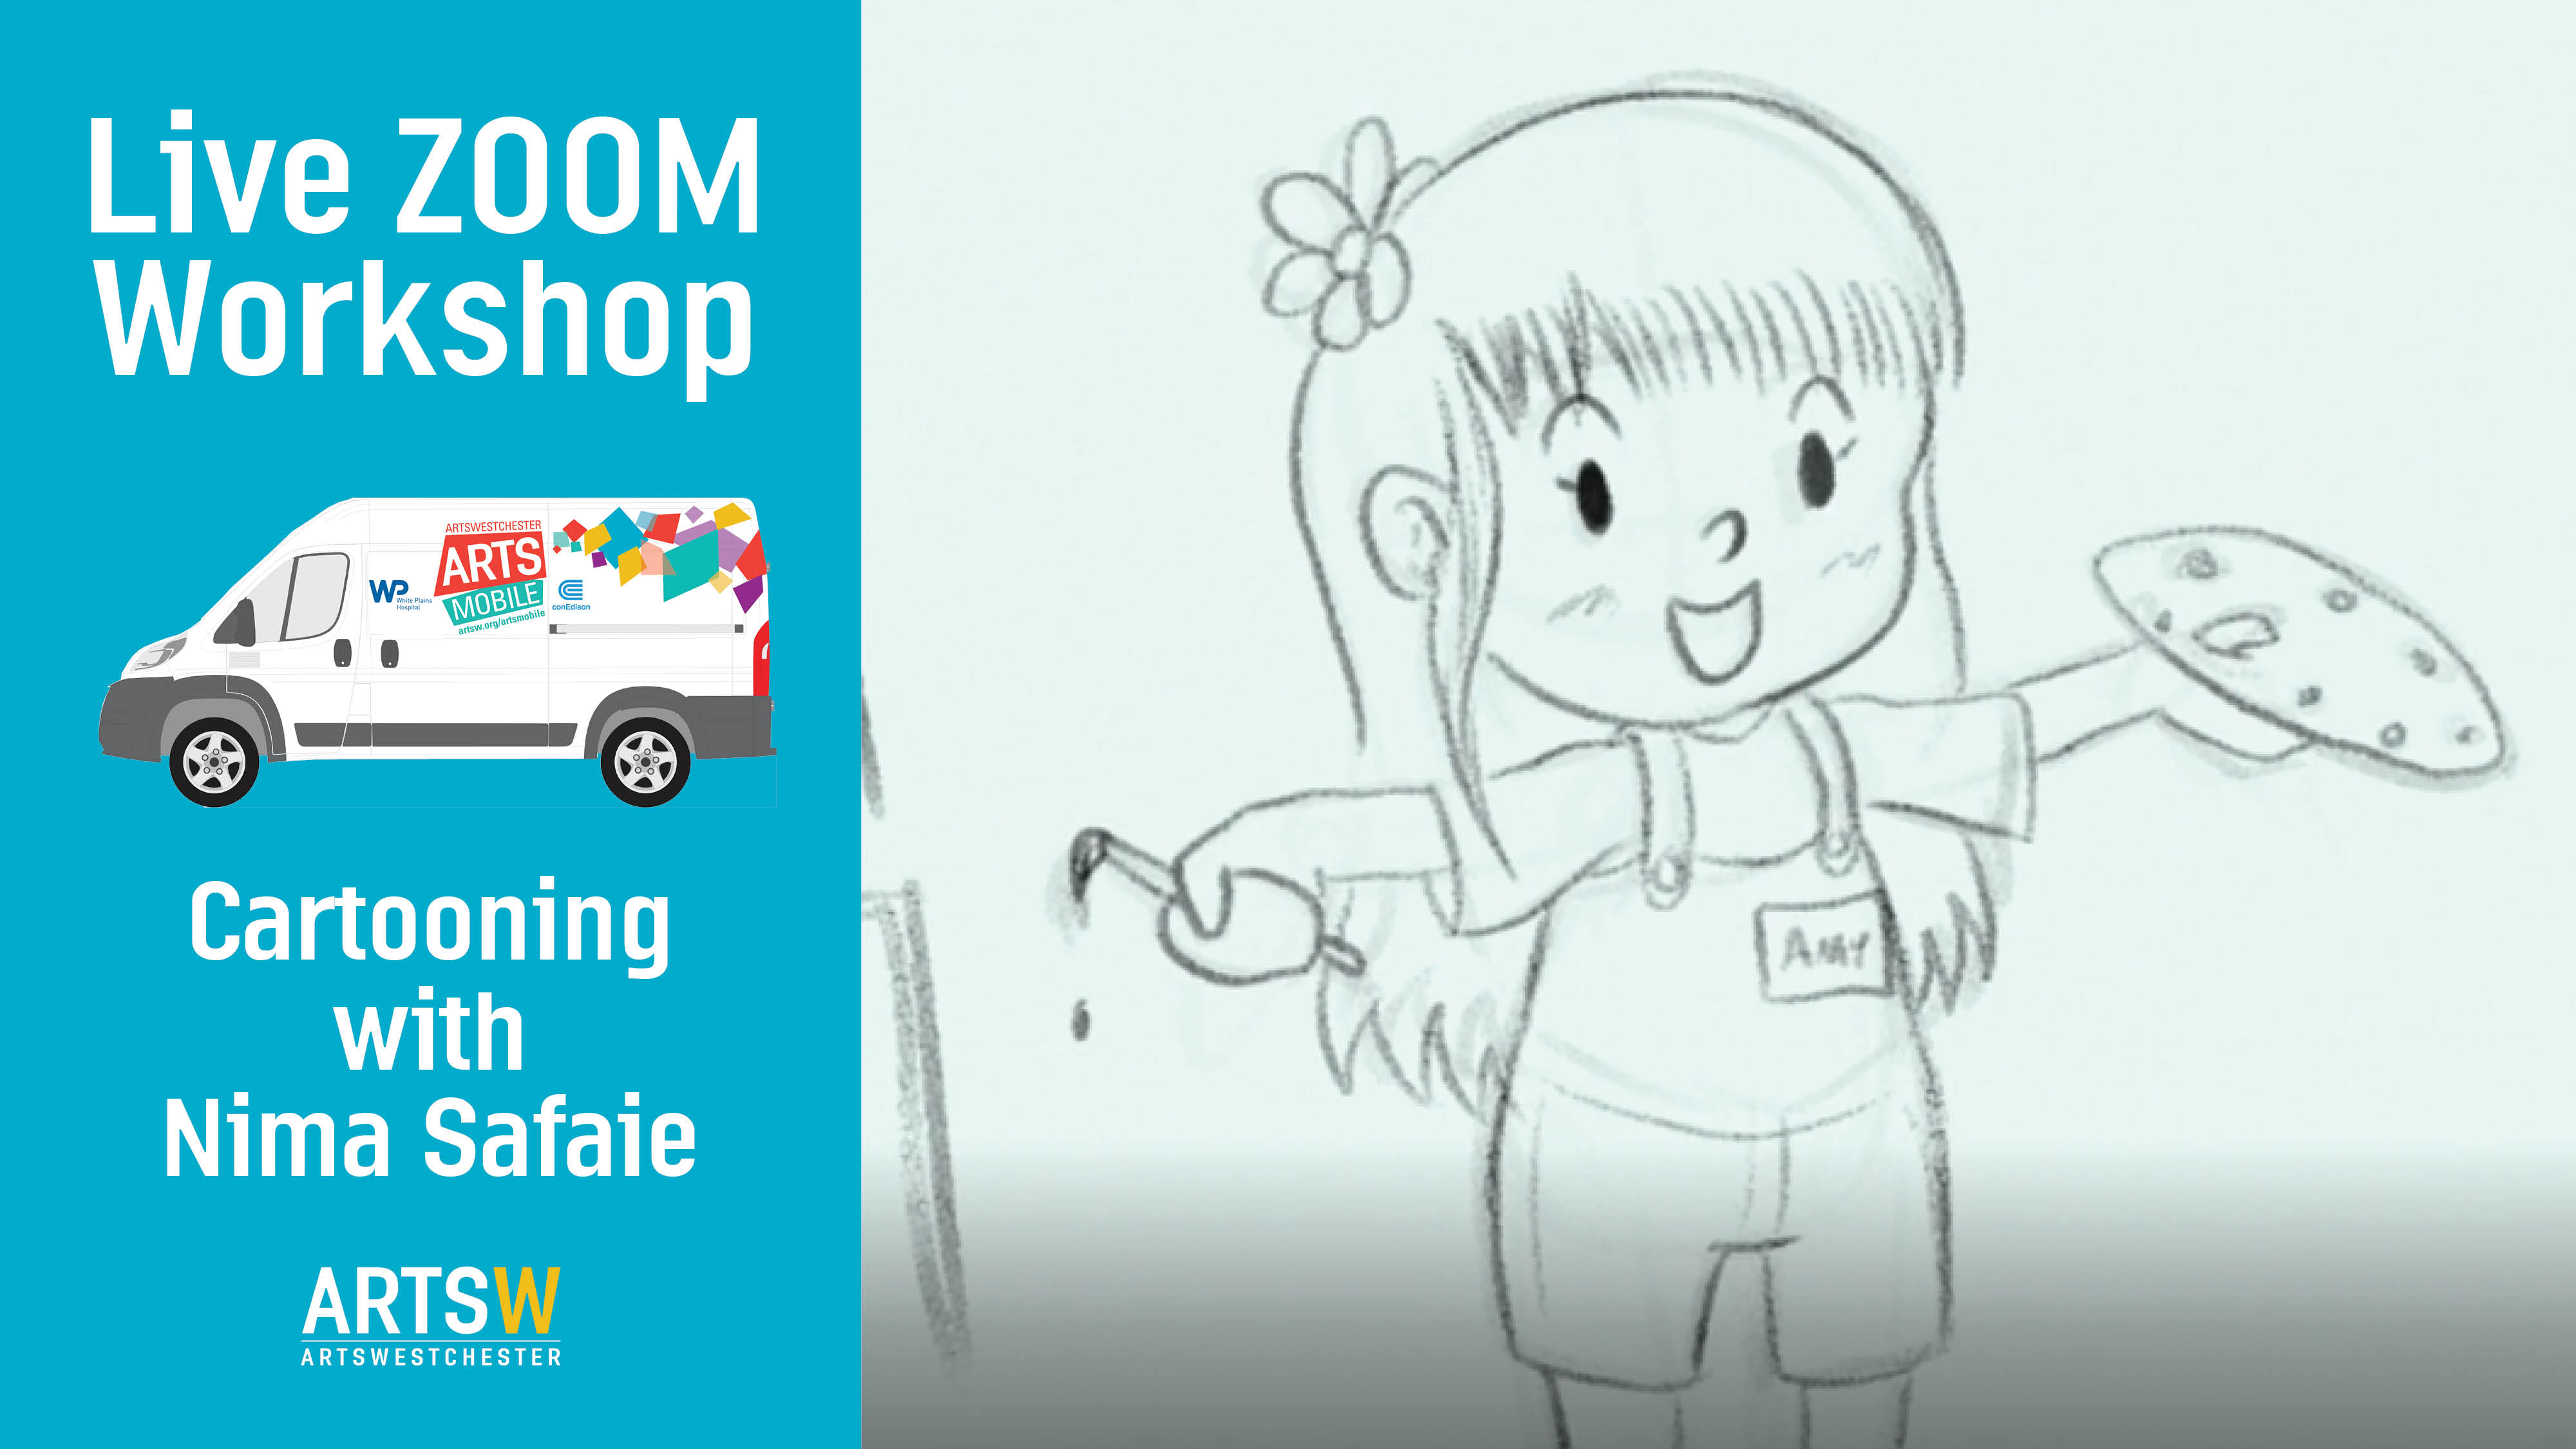 ONLINE Free Cartooning Workshop on ZOOM for kids ages 7-12 yrs! at ArtsWestchester